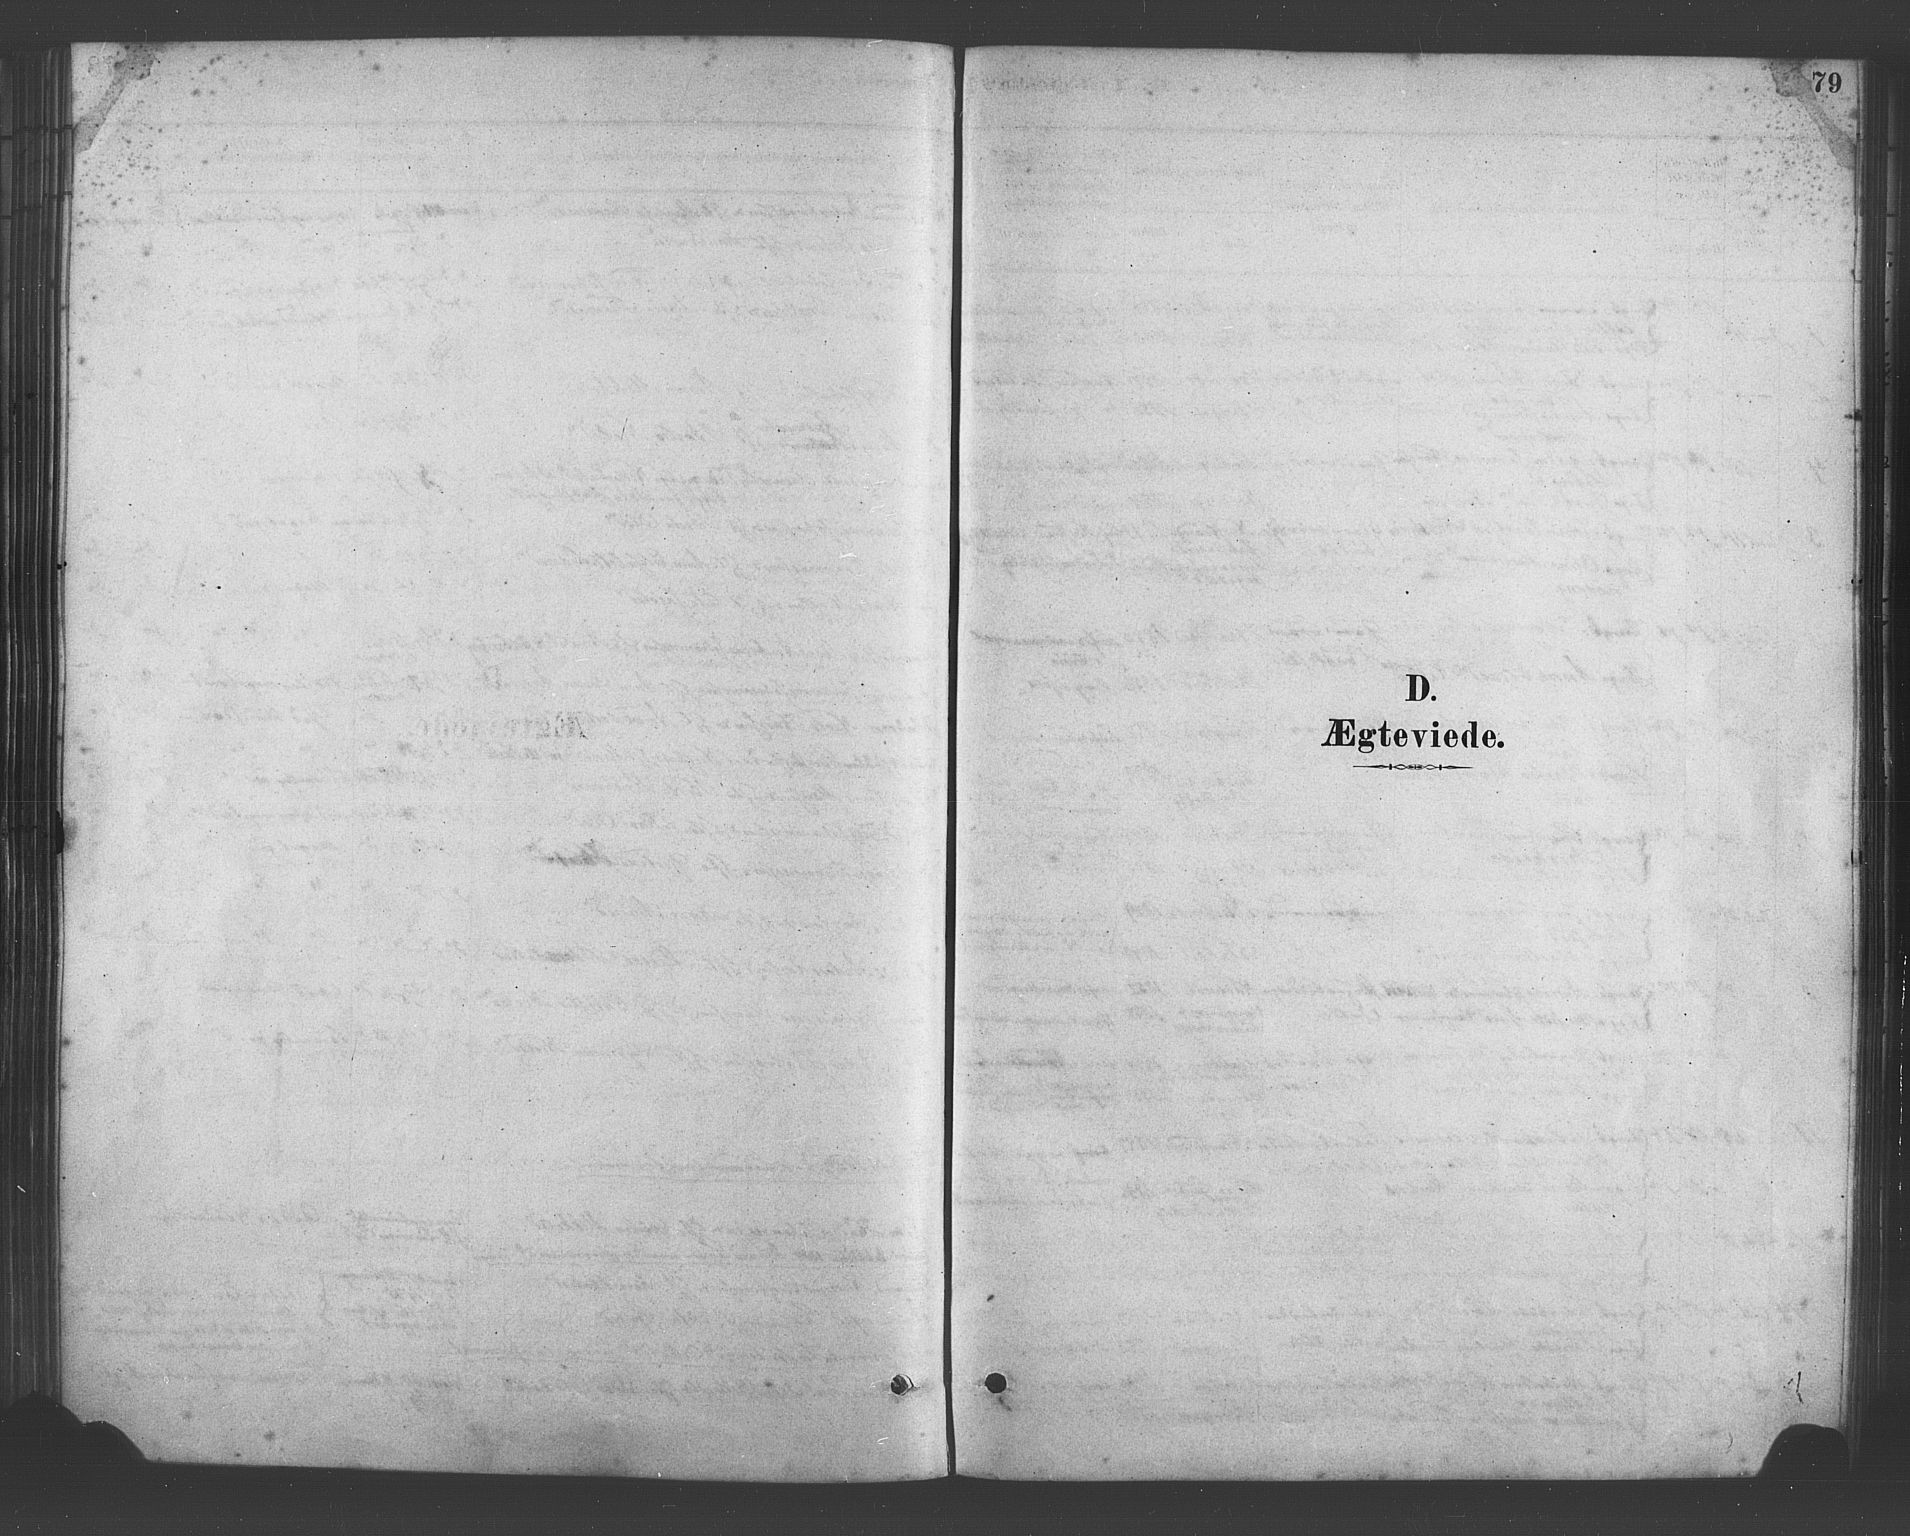 SAB, Fana Sokneprestembete, H/Haa/Haab/L0001: Ministerialbok nr. B 1, 1878-1889, s. 79